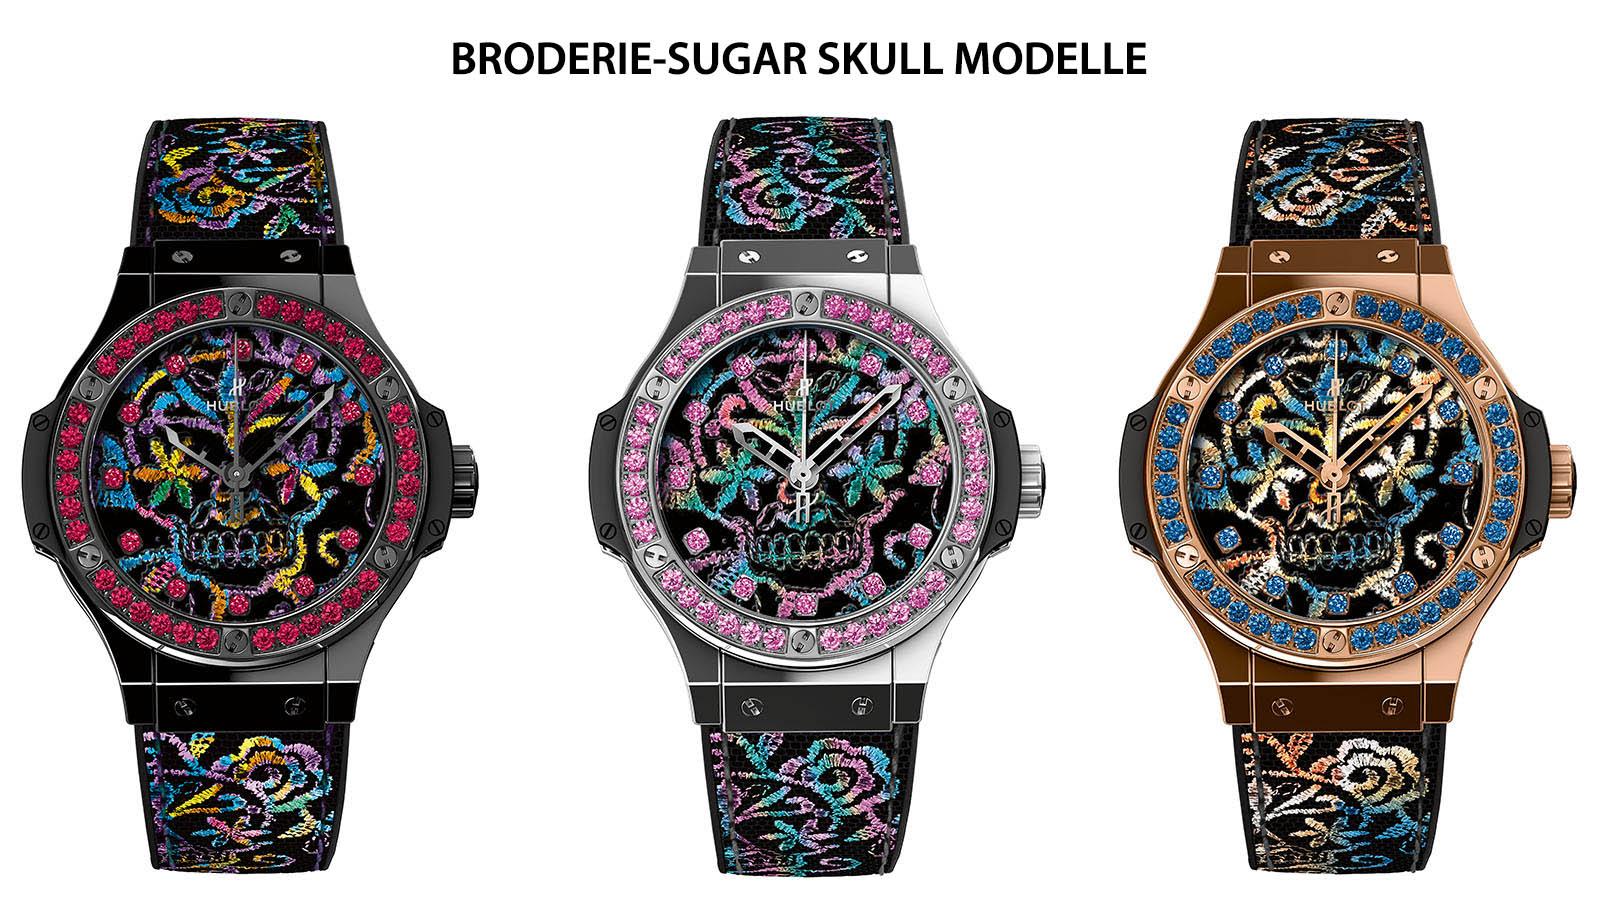 Hublot - Big Bang Broderie Sugar Skull